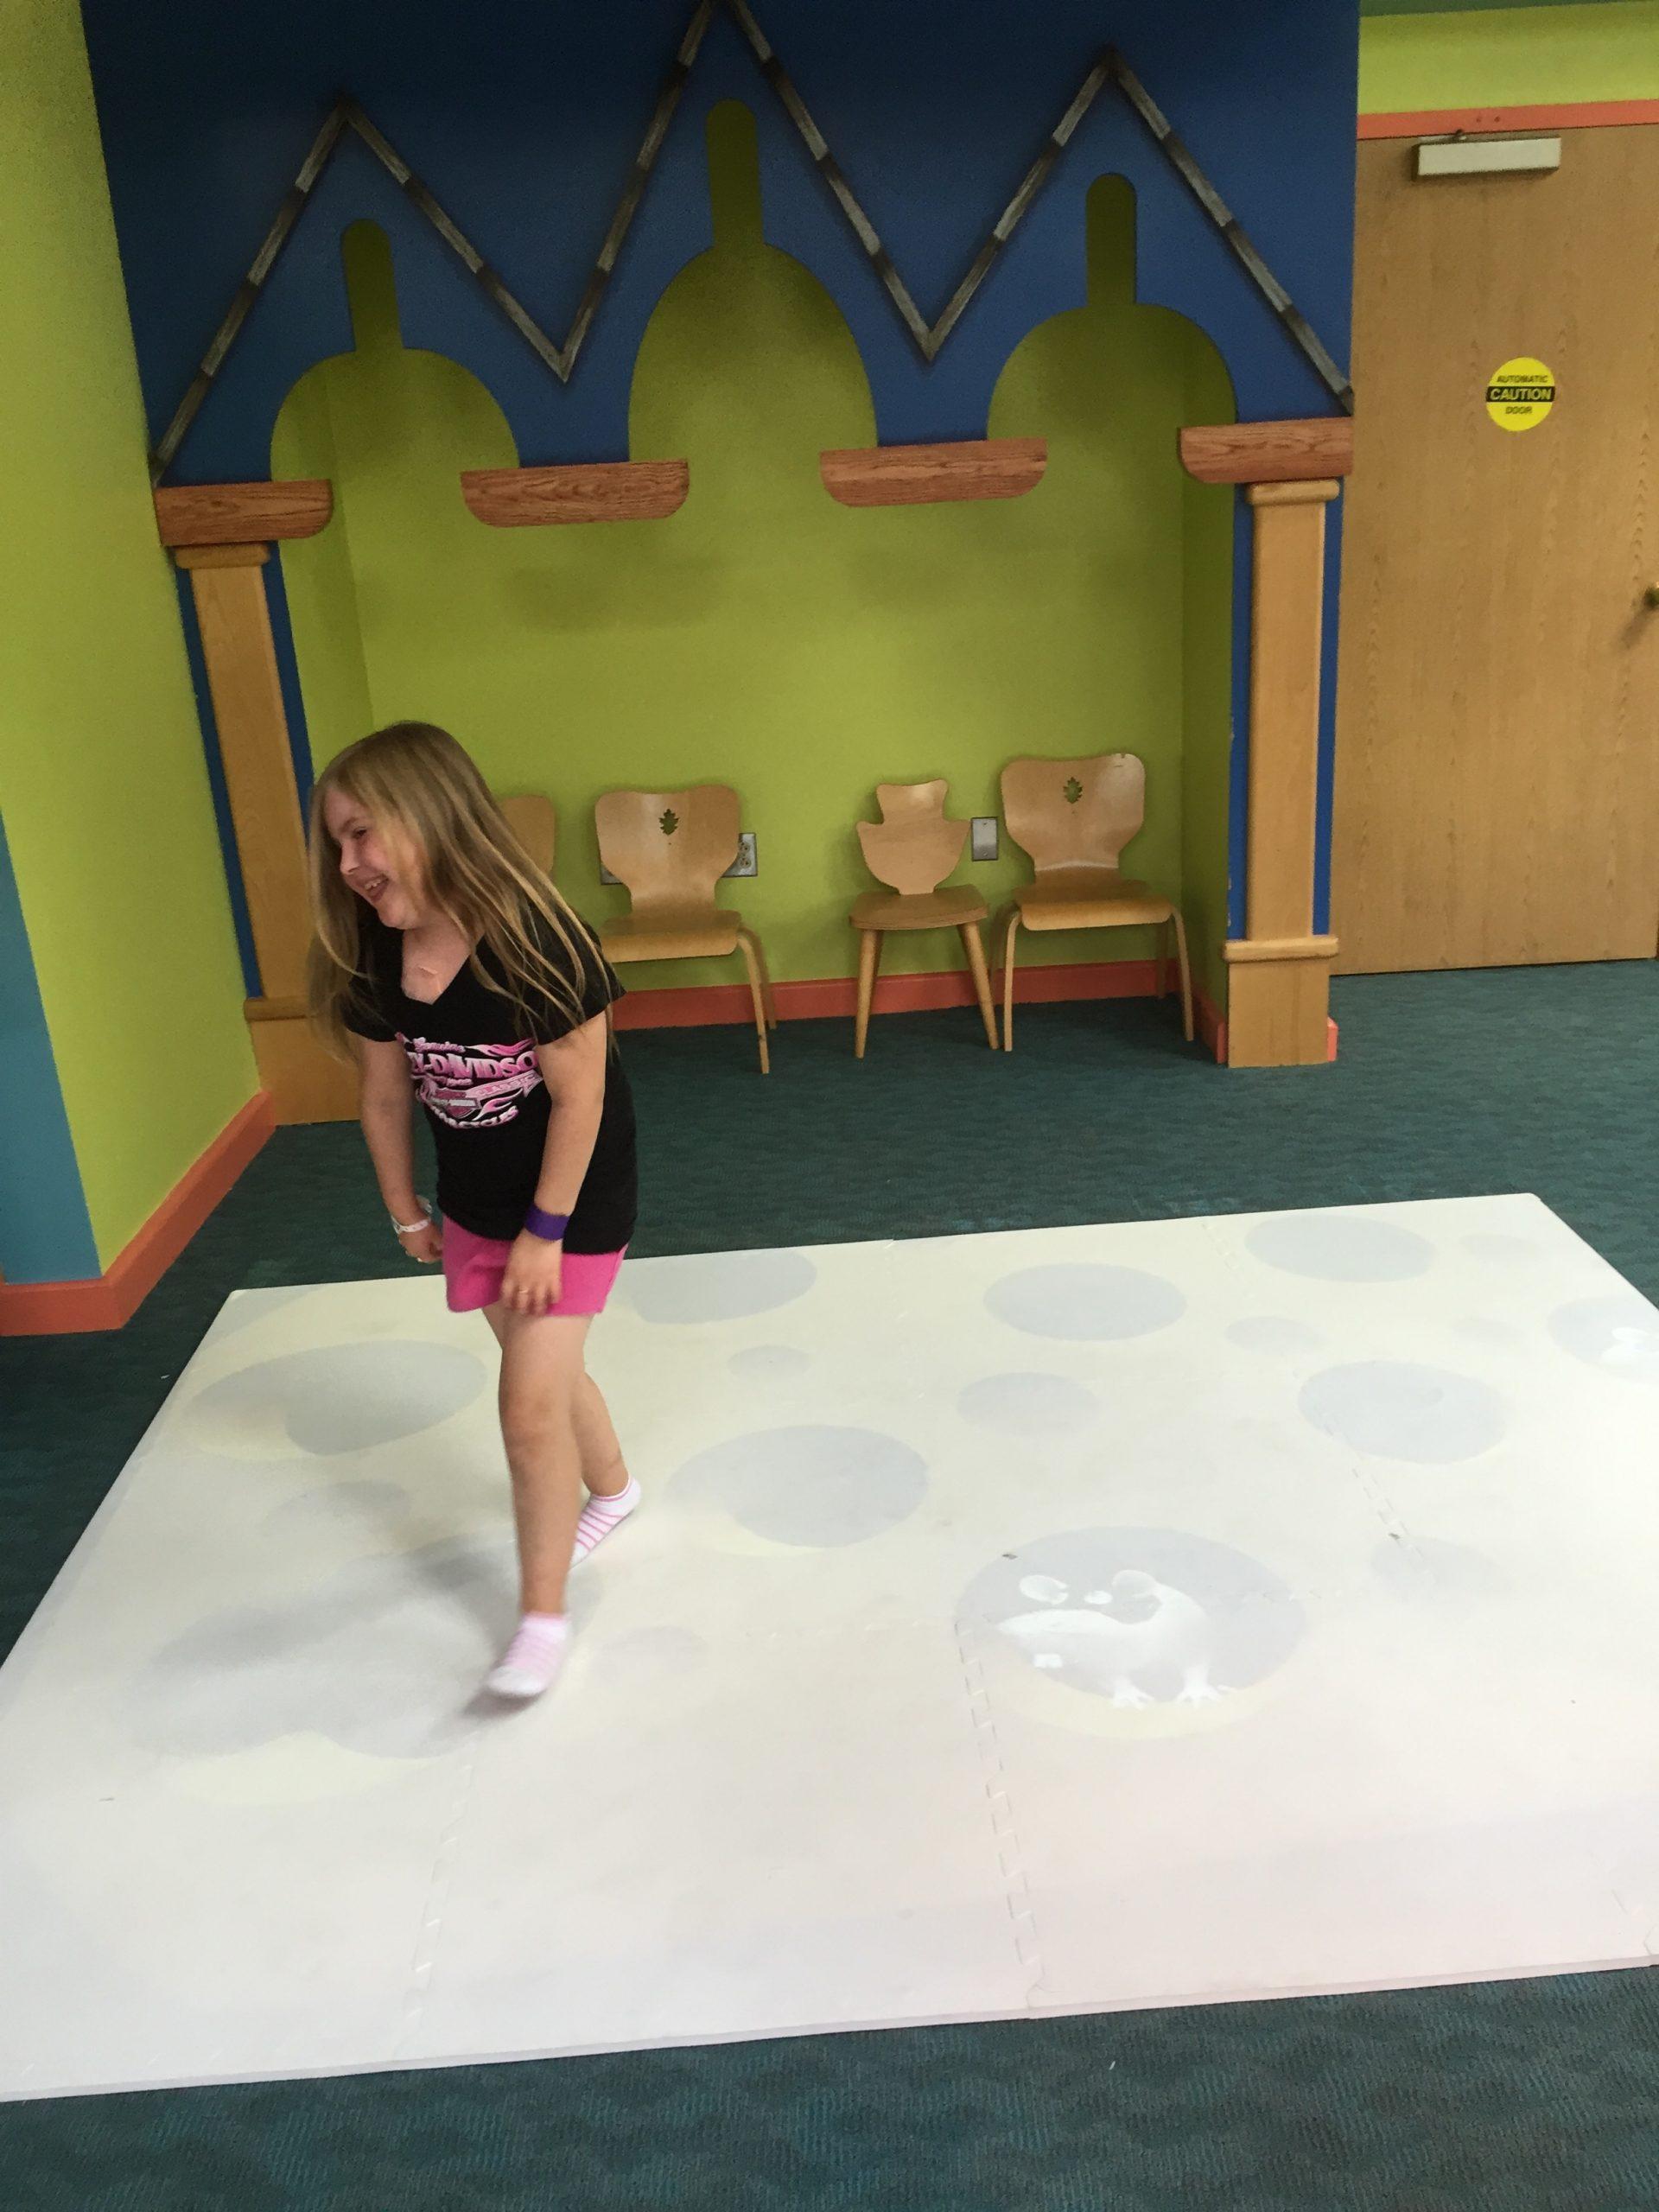 little girl enjoys interactive games